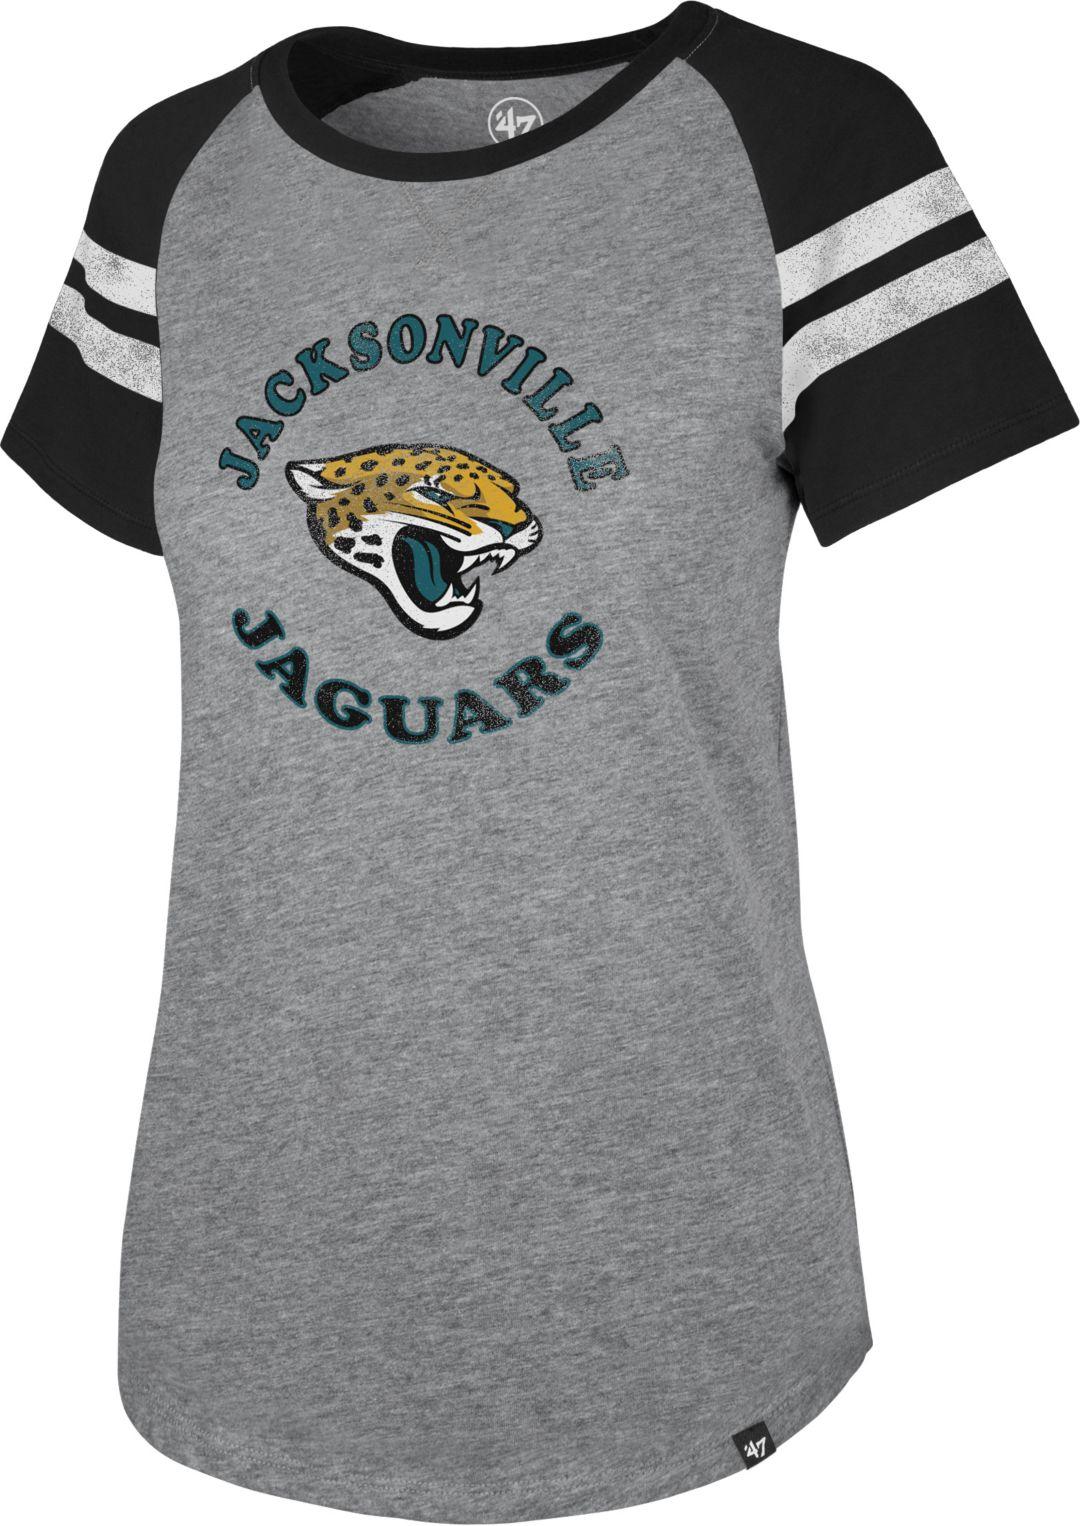 finest selection 87c87 2a1e9 '47 Women's Jacksonville Jaguars Fly Out Raglan T-Shirt